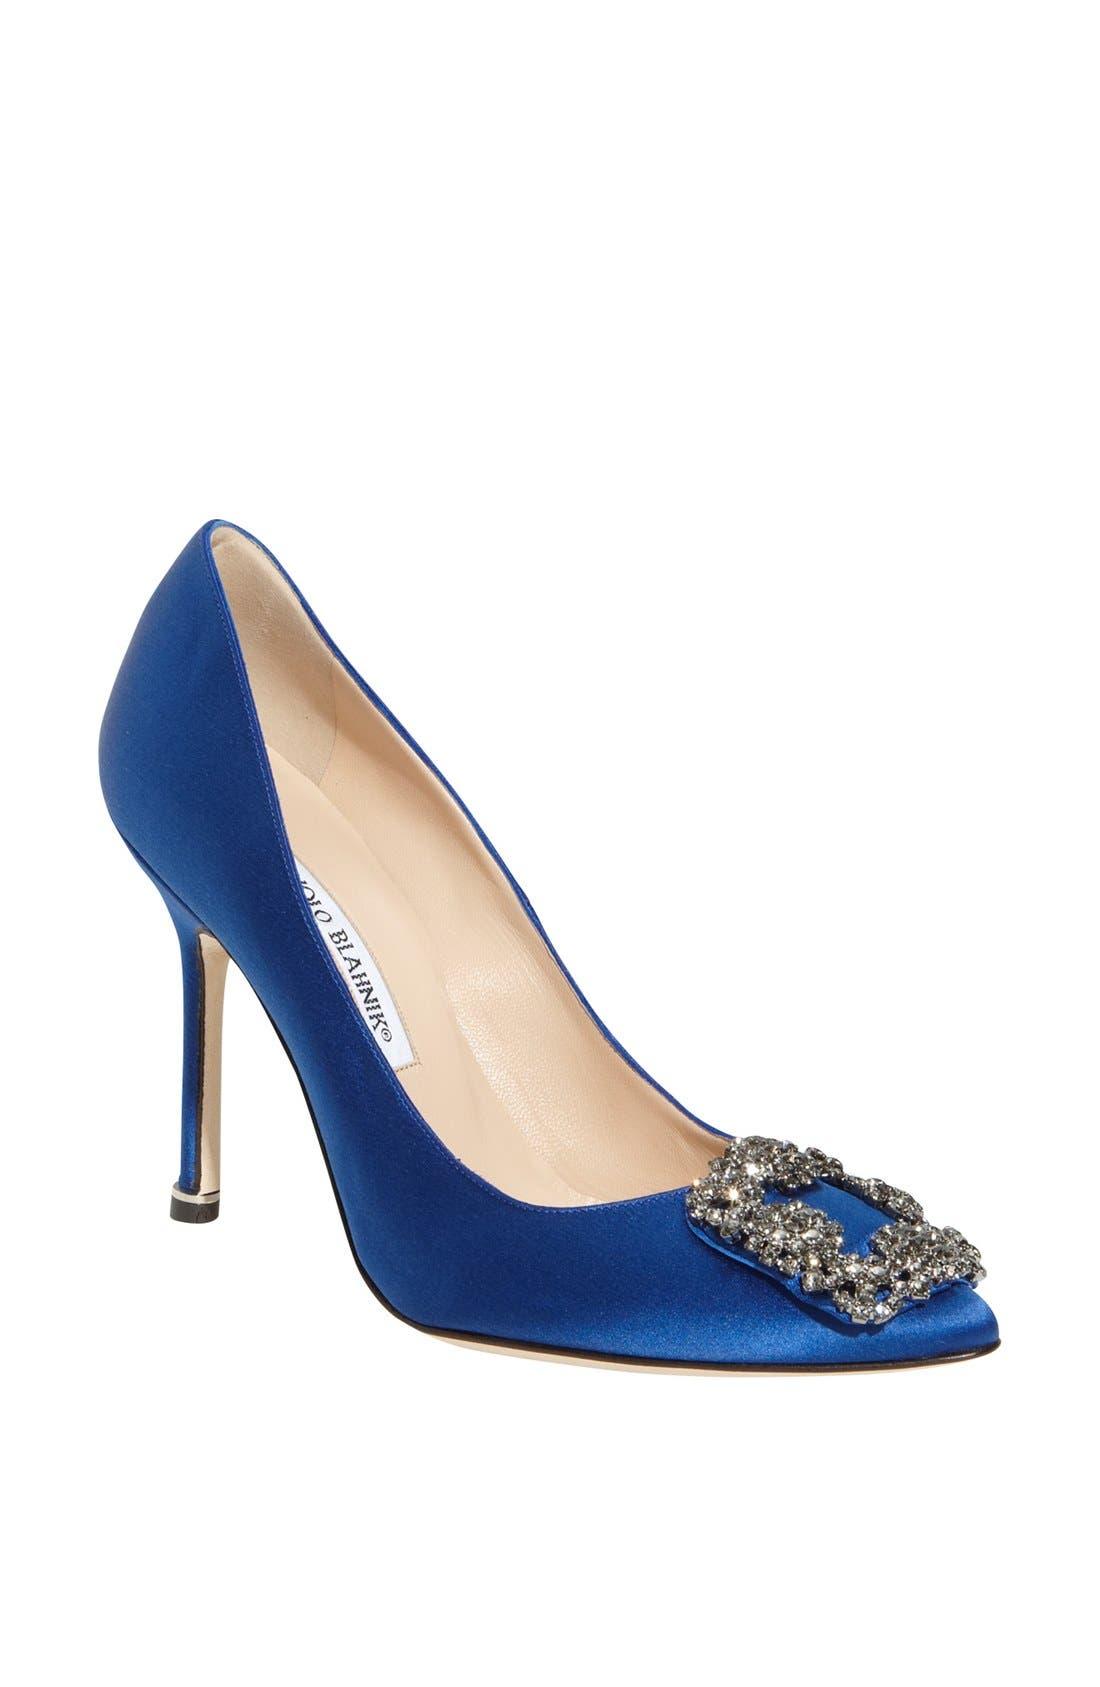 MANOLO BLAHNIK 'Hangisi' Jewel Pump, Main, color, BLUE SATIN